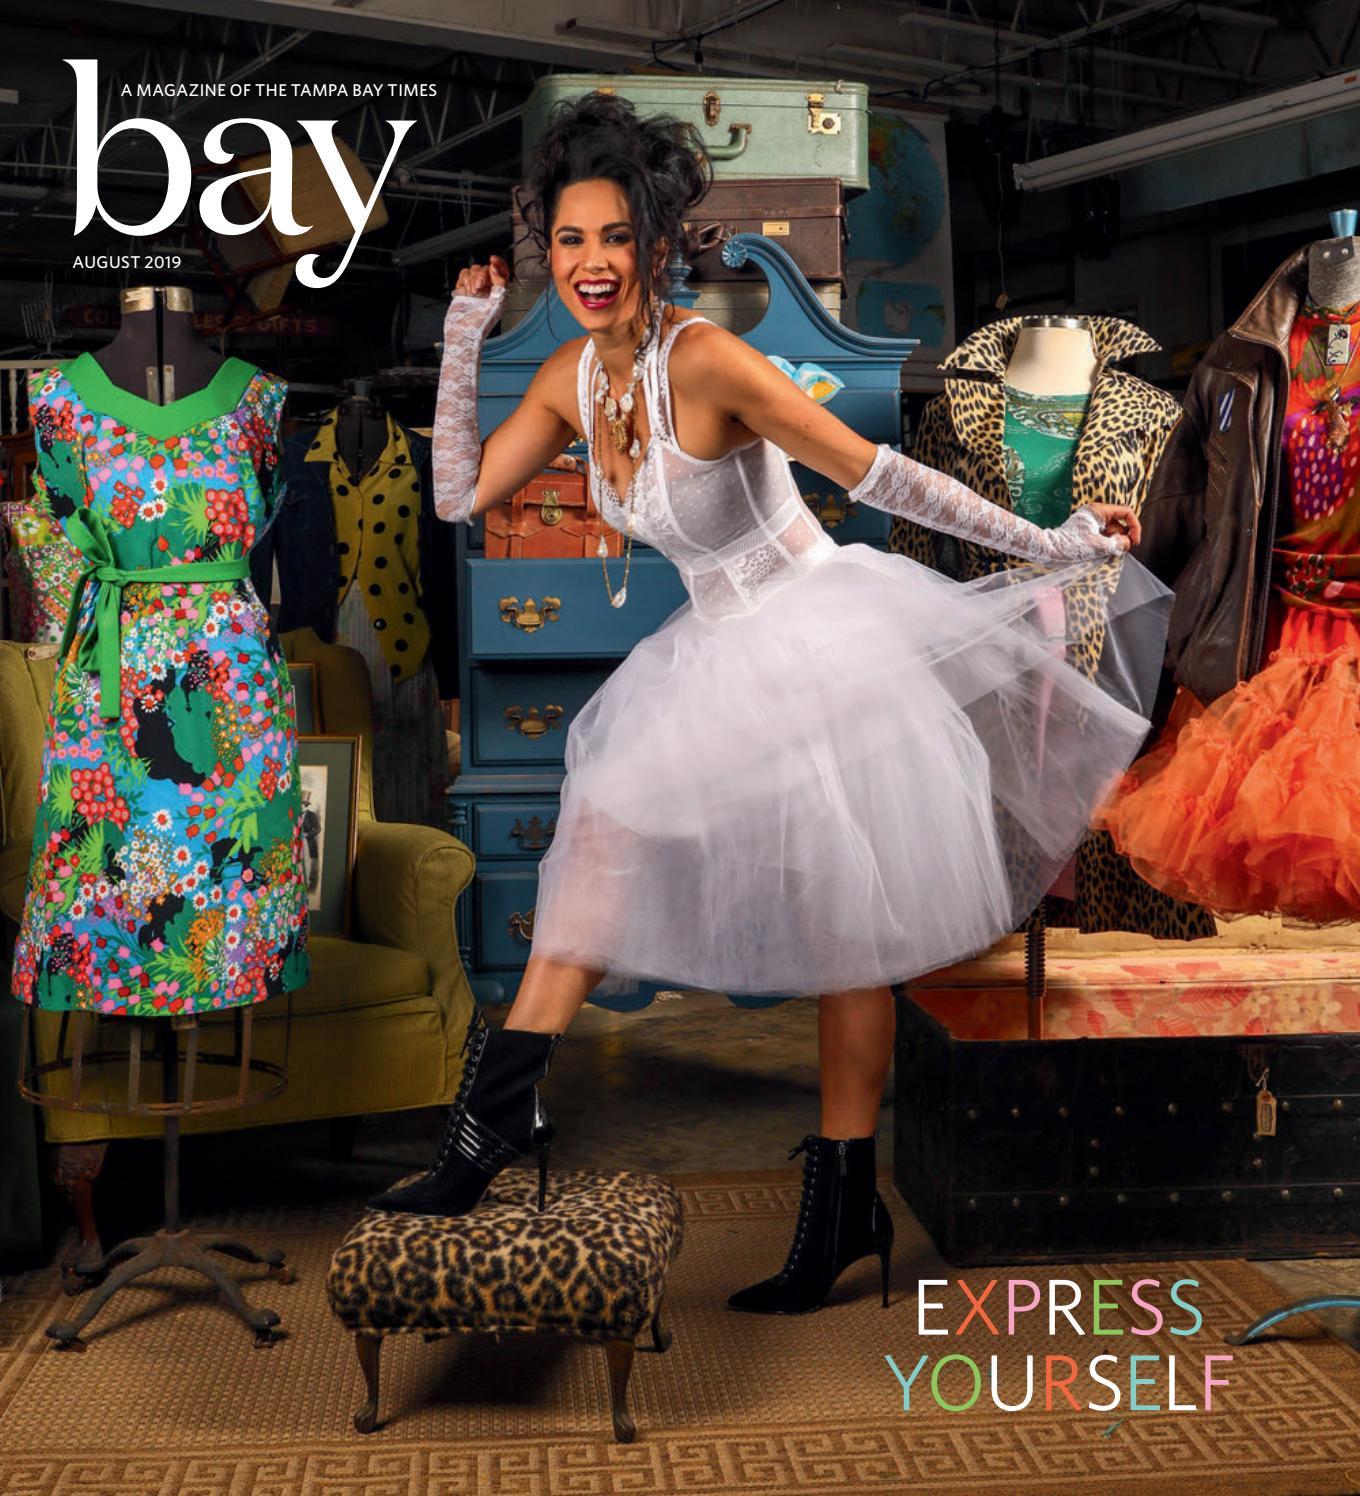 Amy Christine Dumas Nude tampa bay times - bay magazine - august 2019times